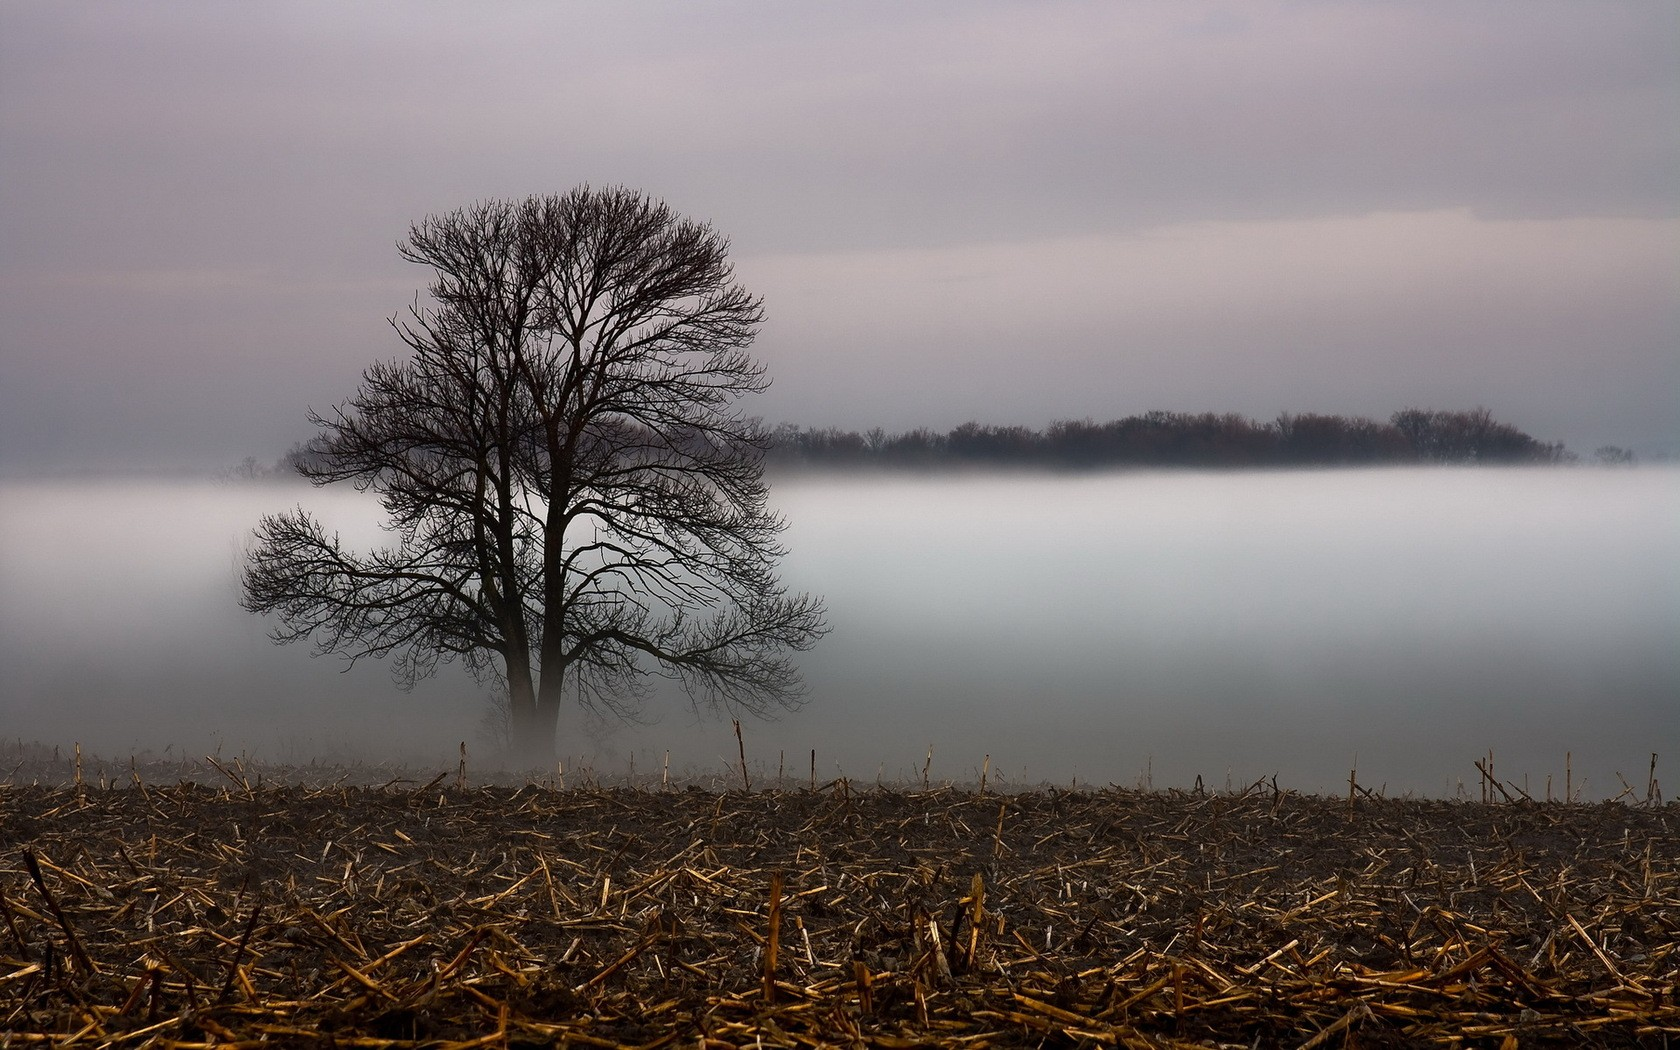 landscapes trees fog - photo #5